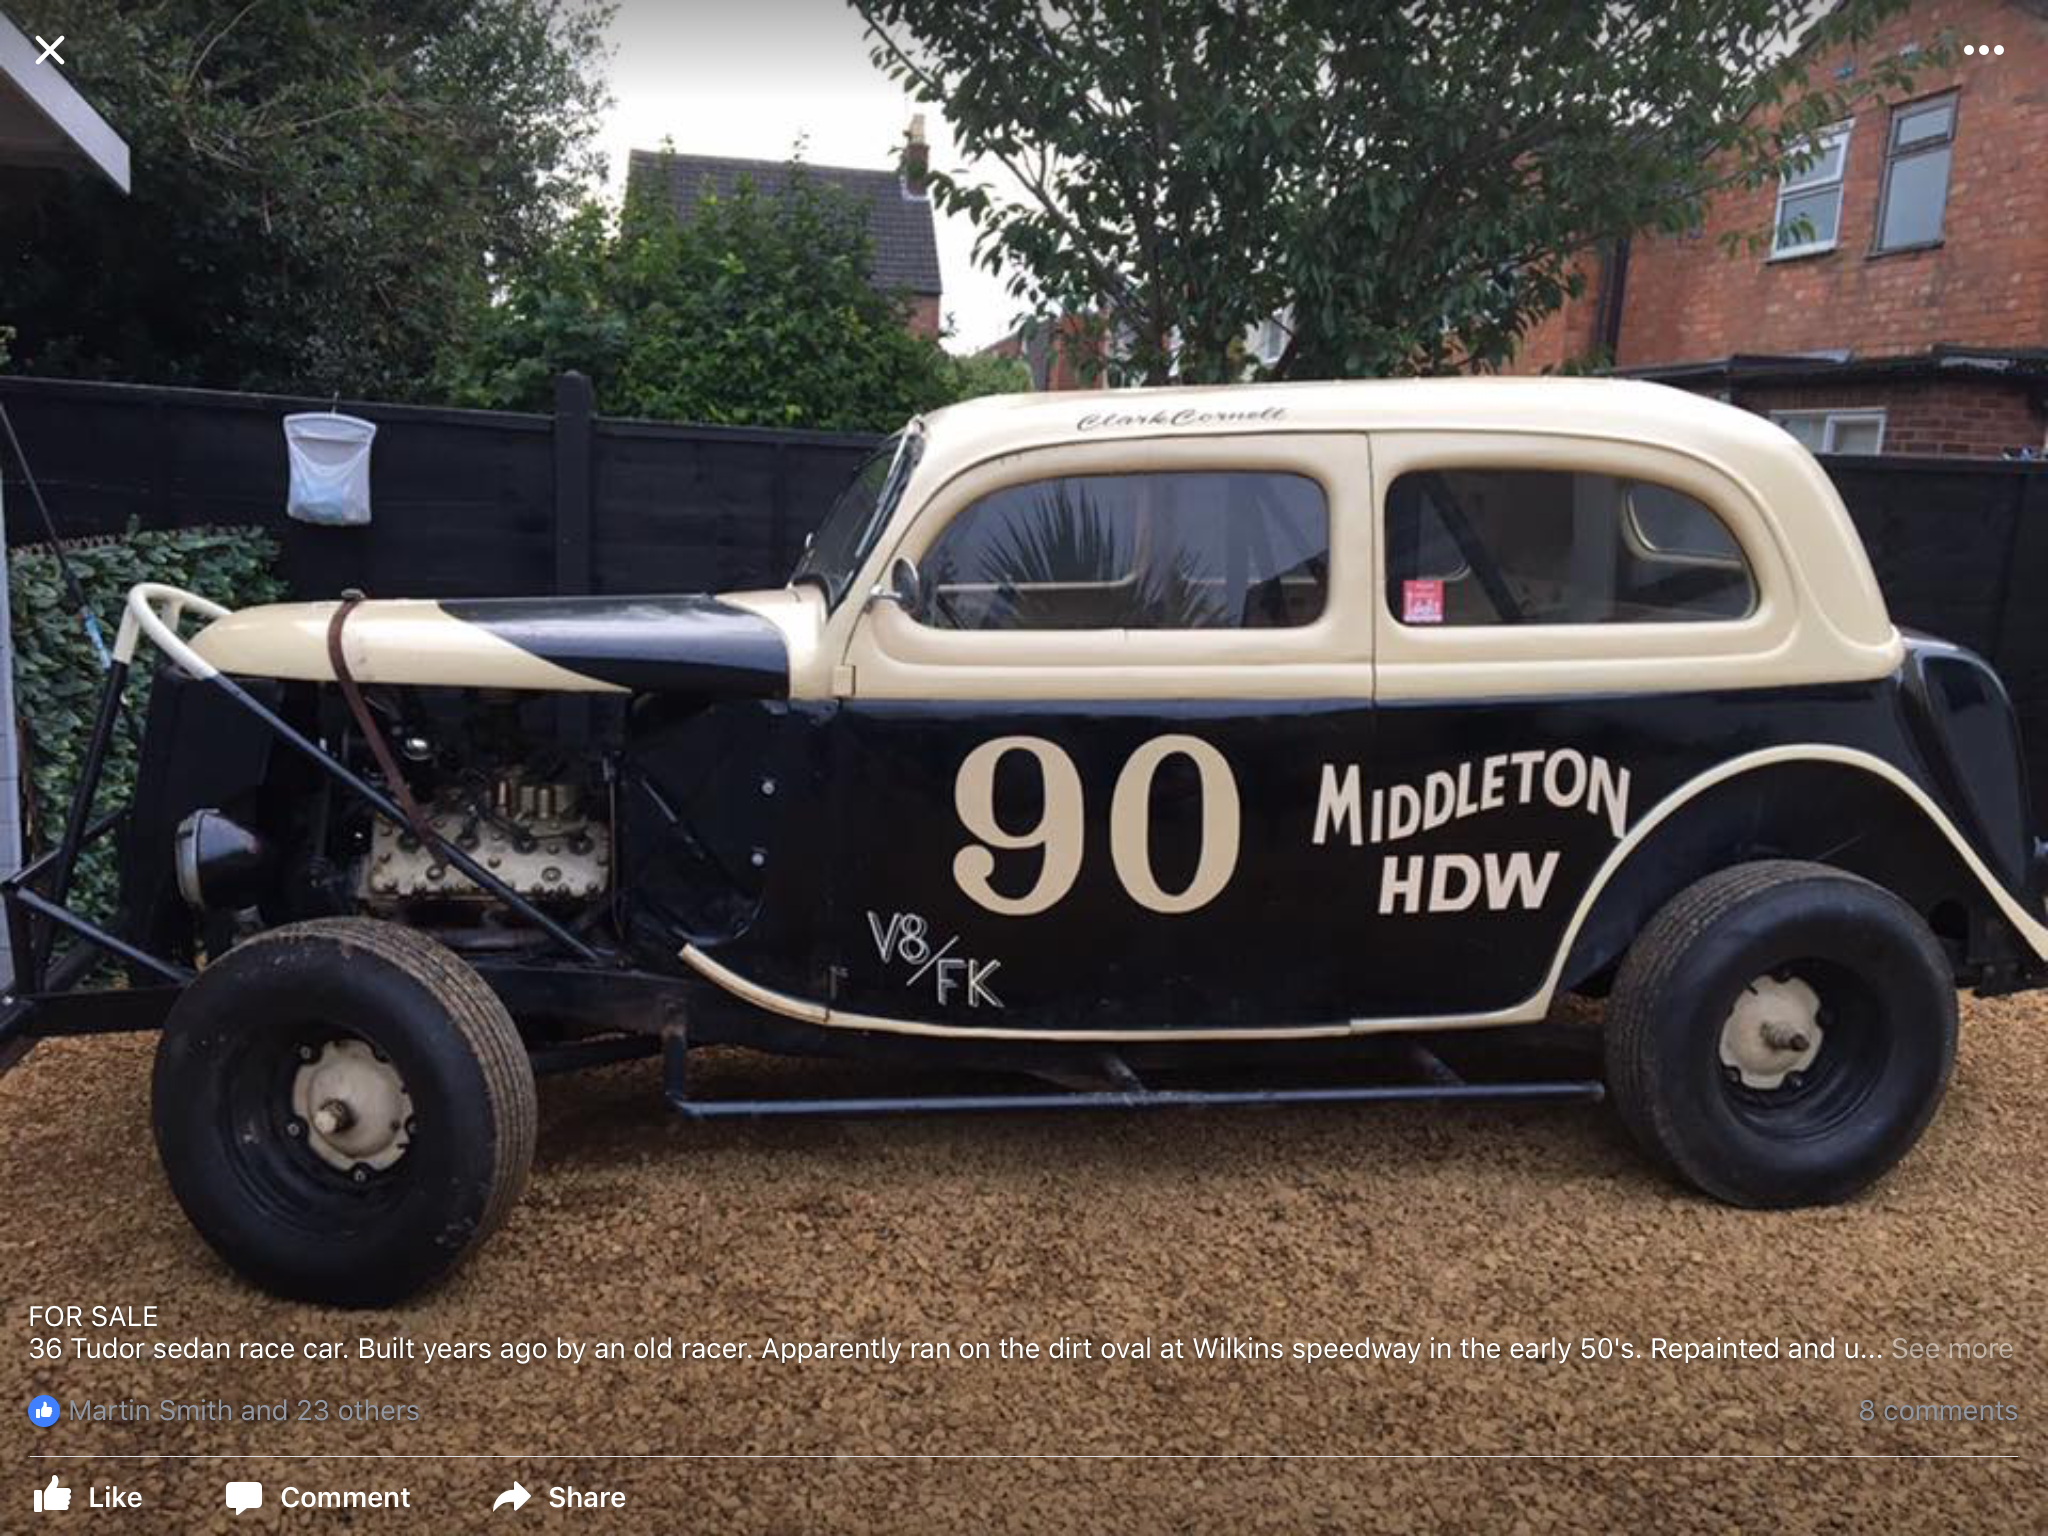 Pin by Charles Wetherbee on Vintage Race Cars | Pinterest | Vintage ...